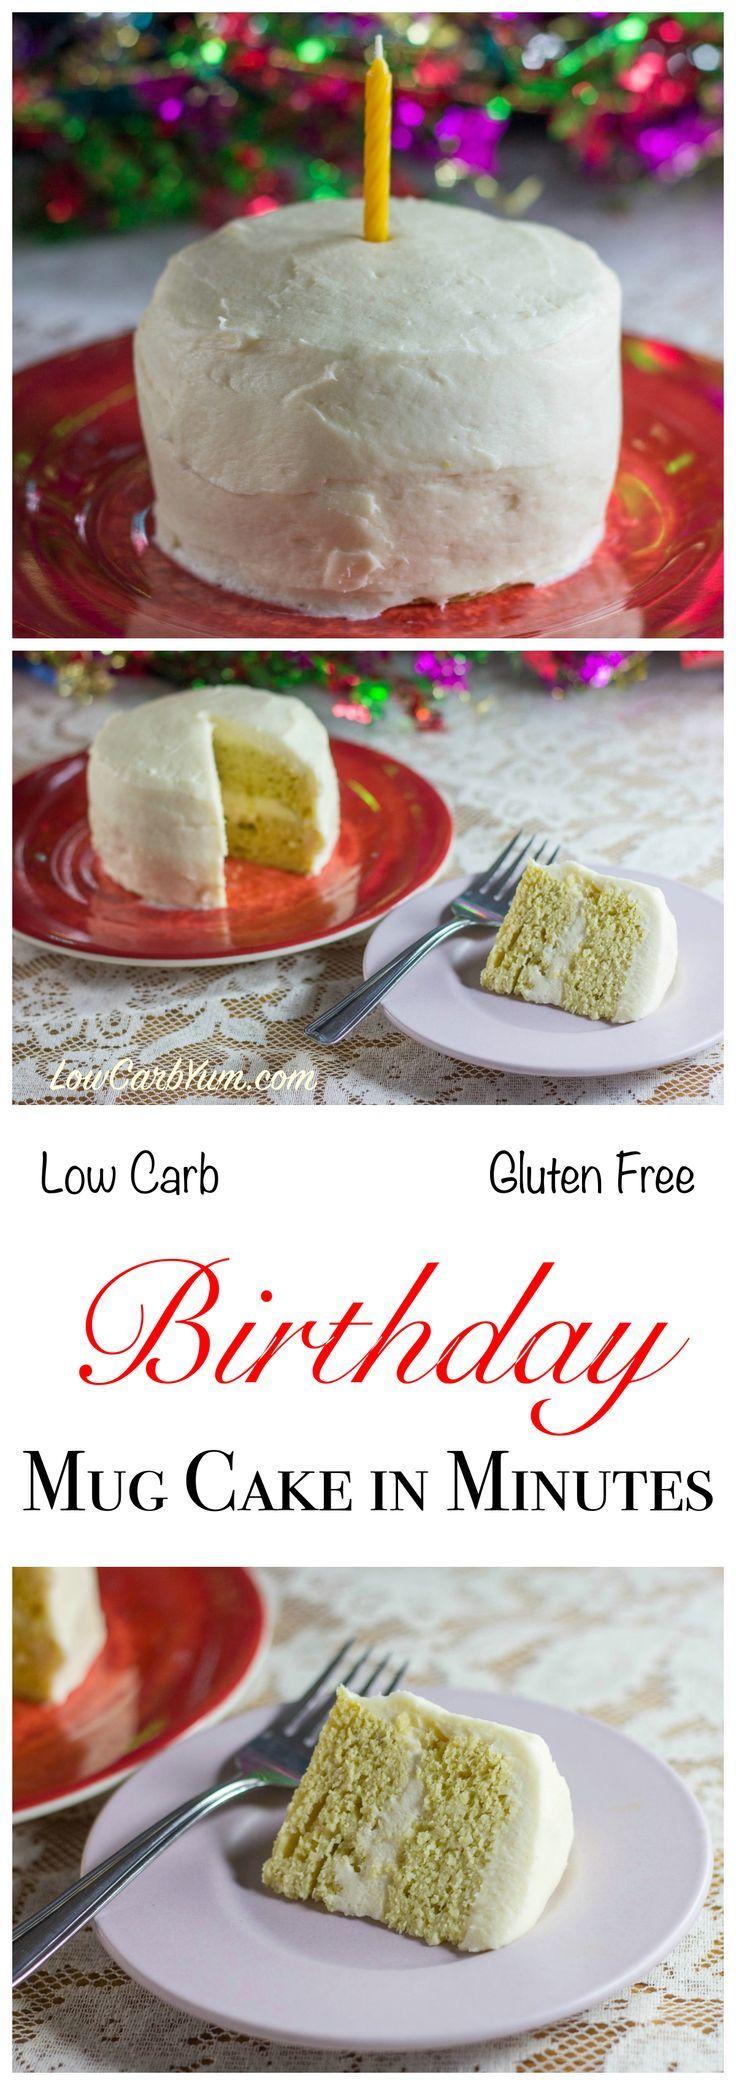 Birthday Mug Cake in Minutes | Recipe | Low carb mug cakes ...